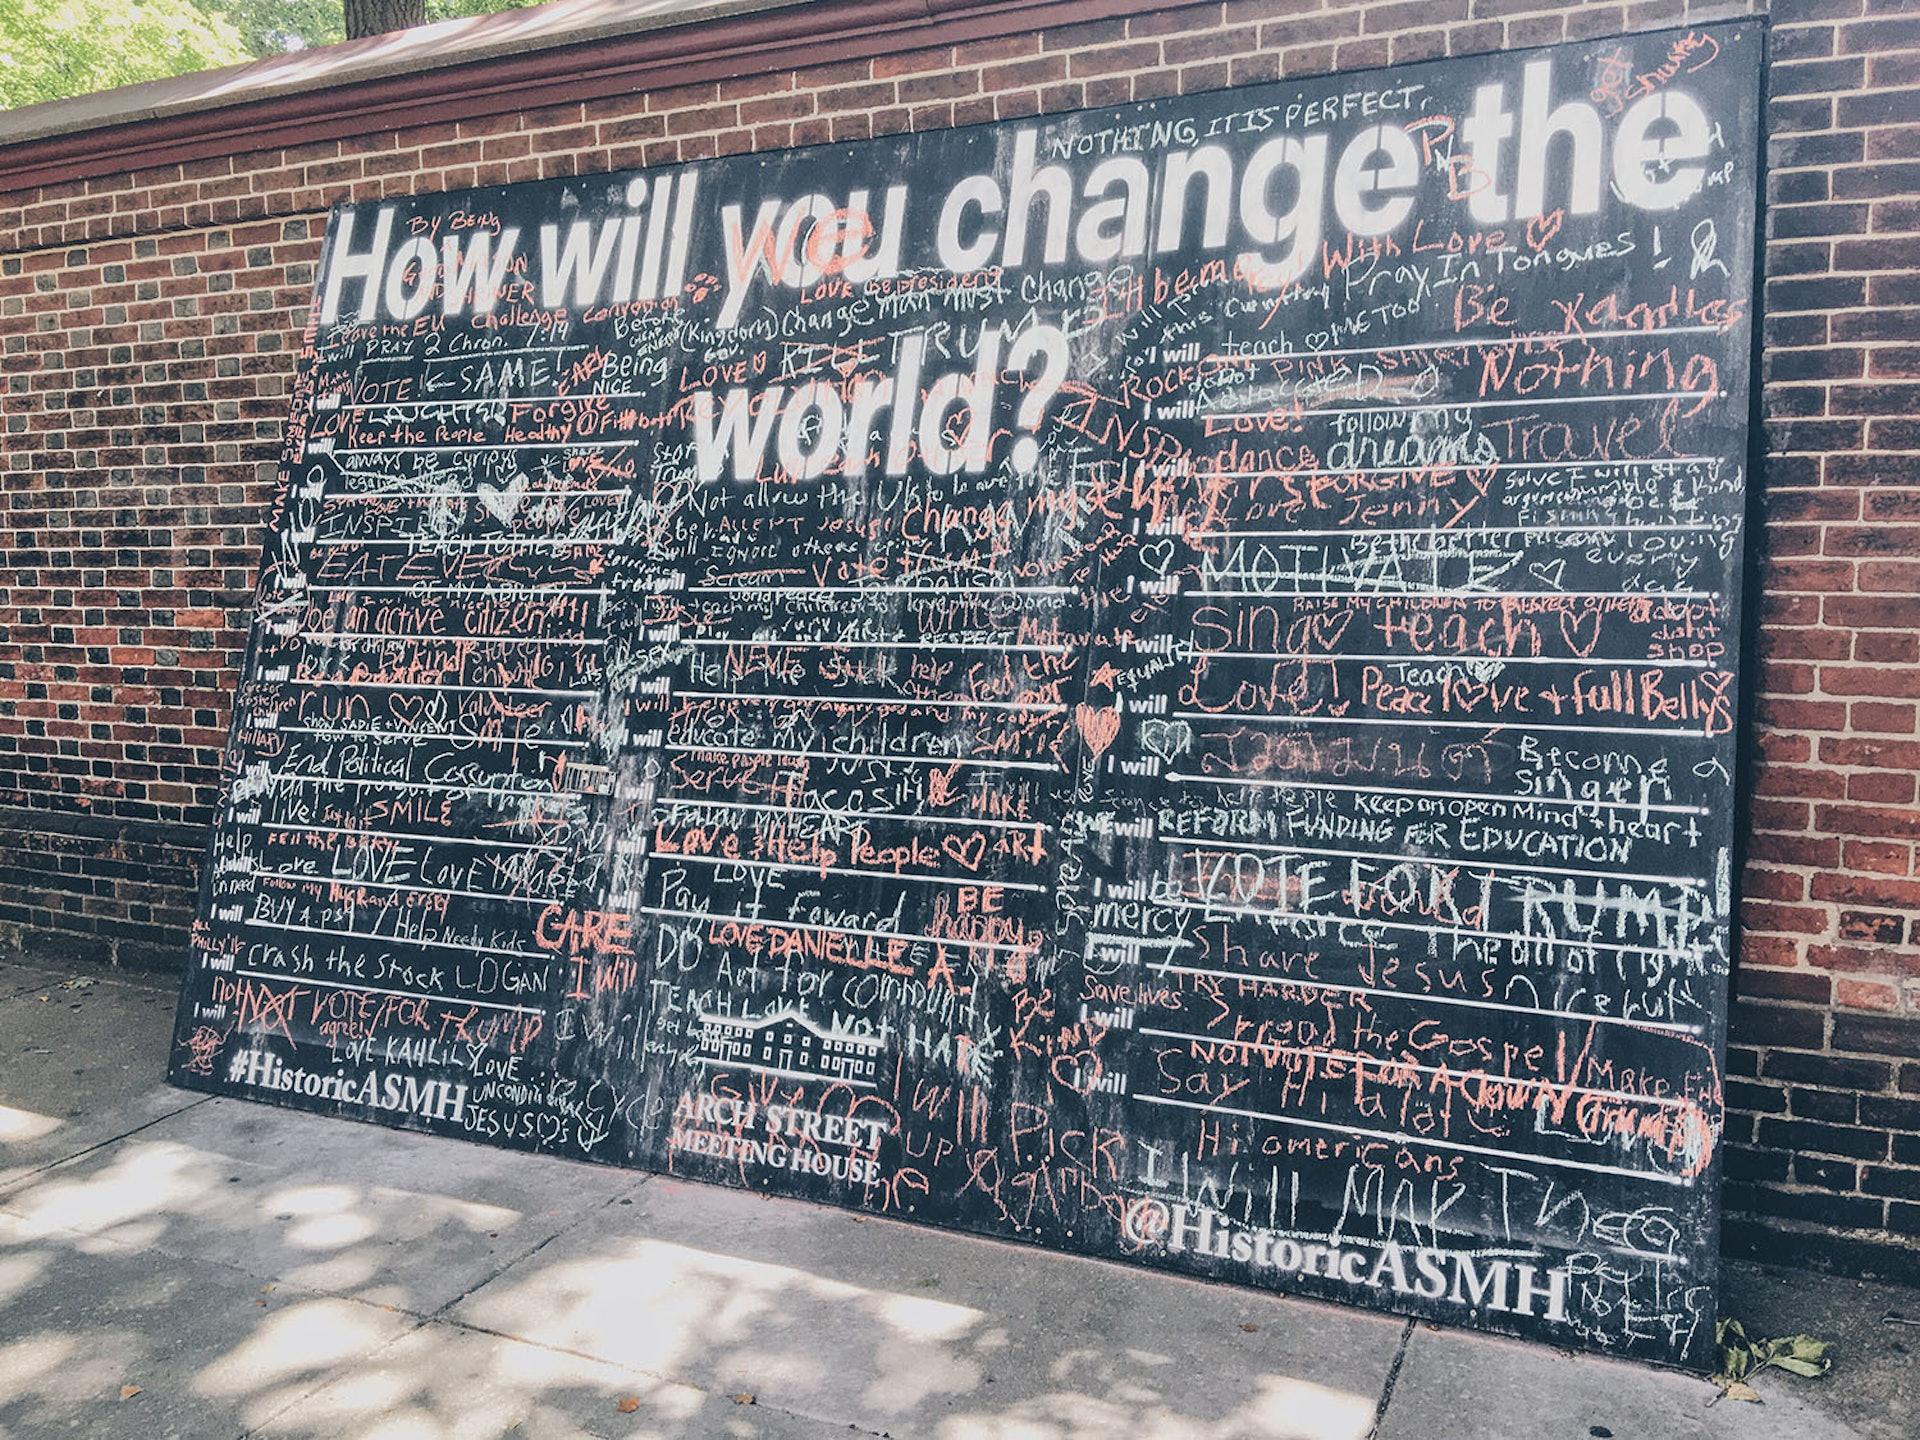 Public chalk display on Arch Street in Philadelphia